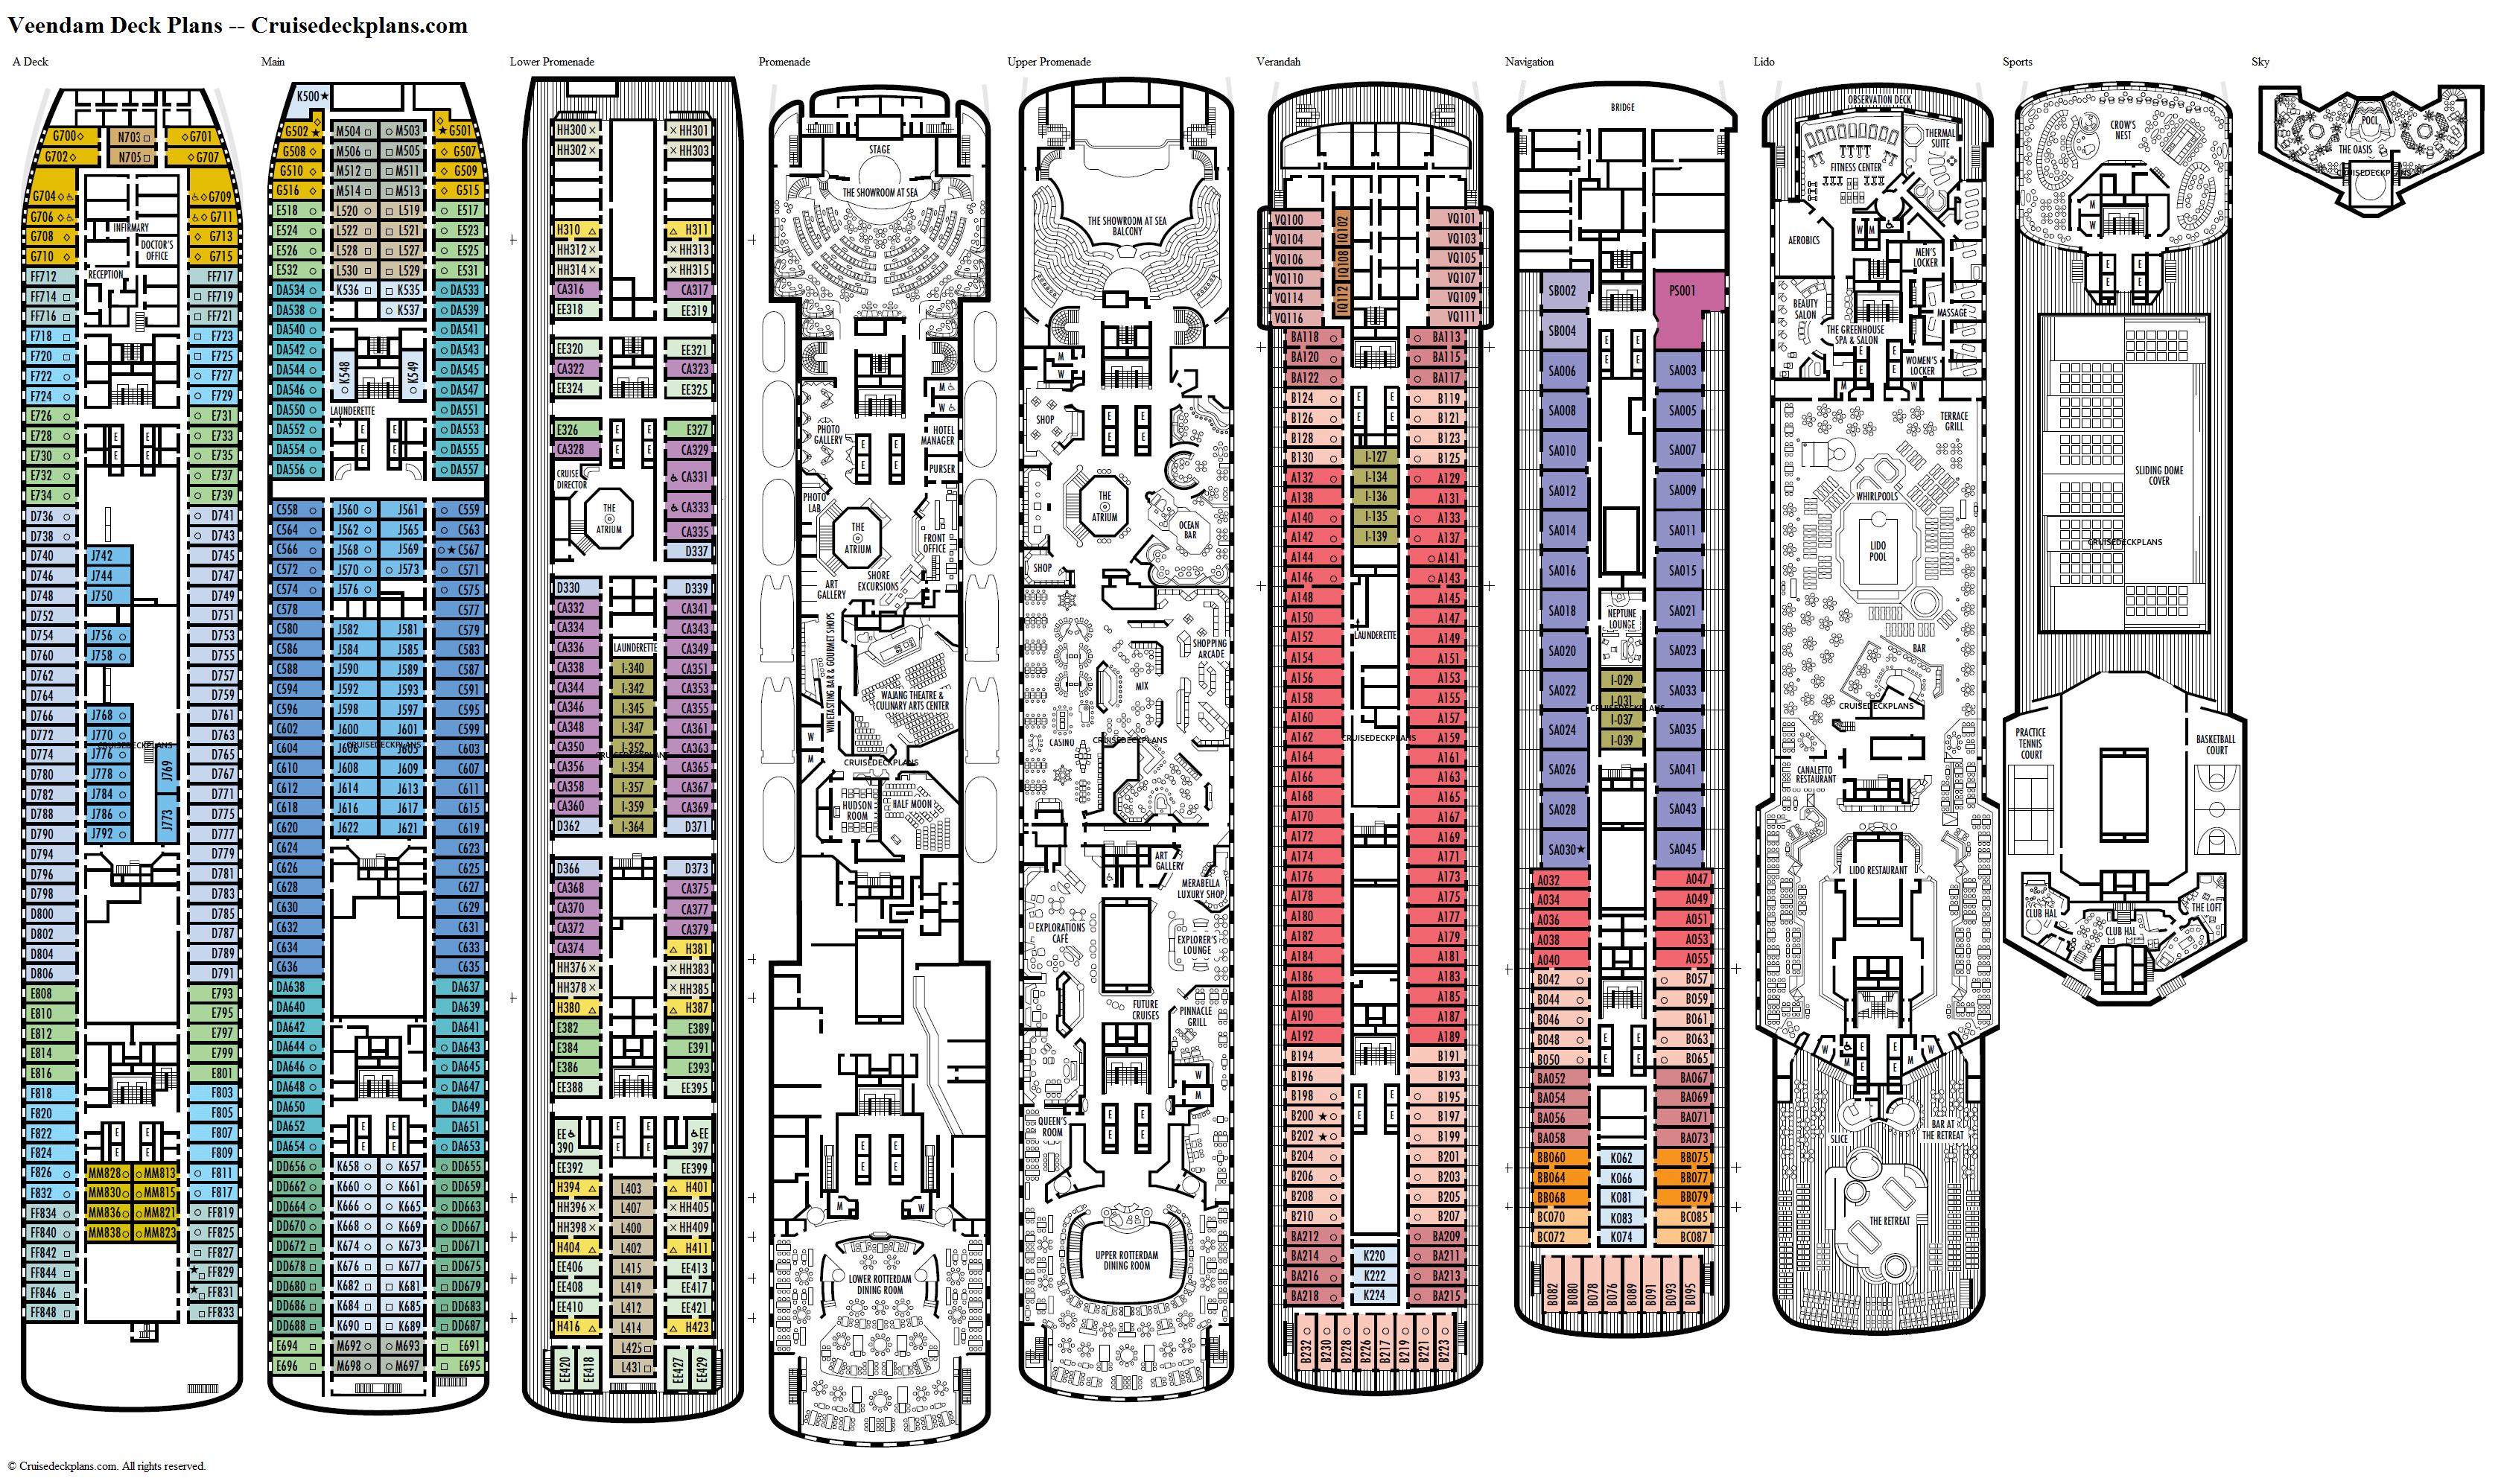 Veendam Deck Plans Diagrams Pictures Video